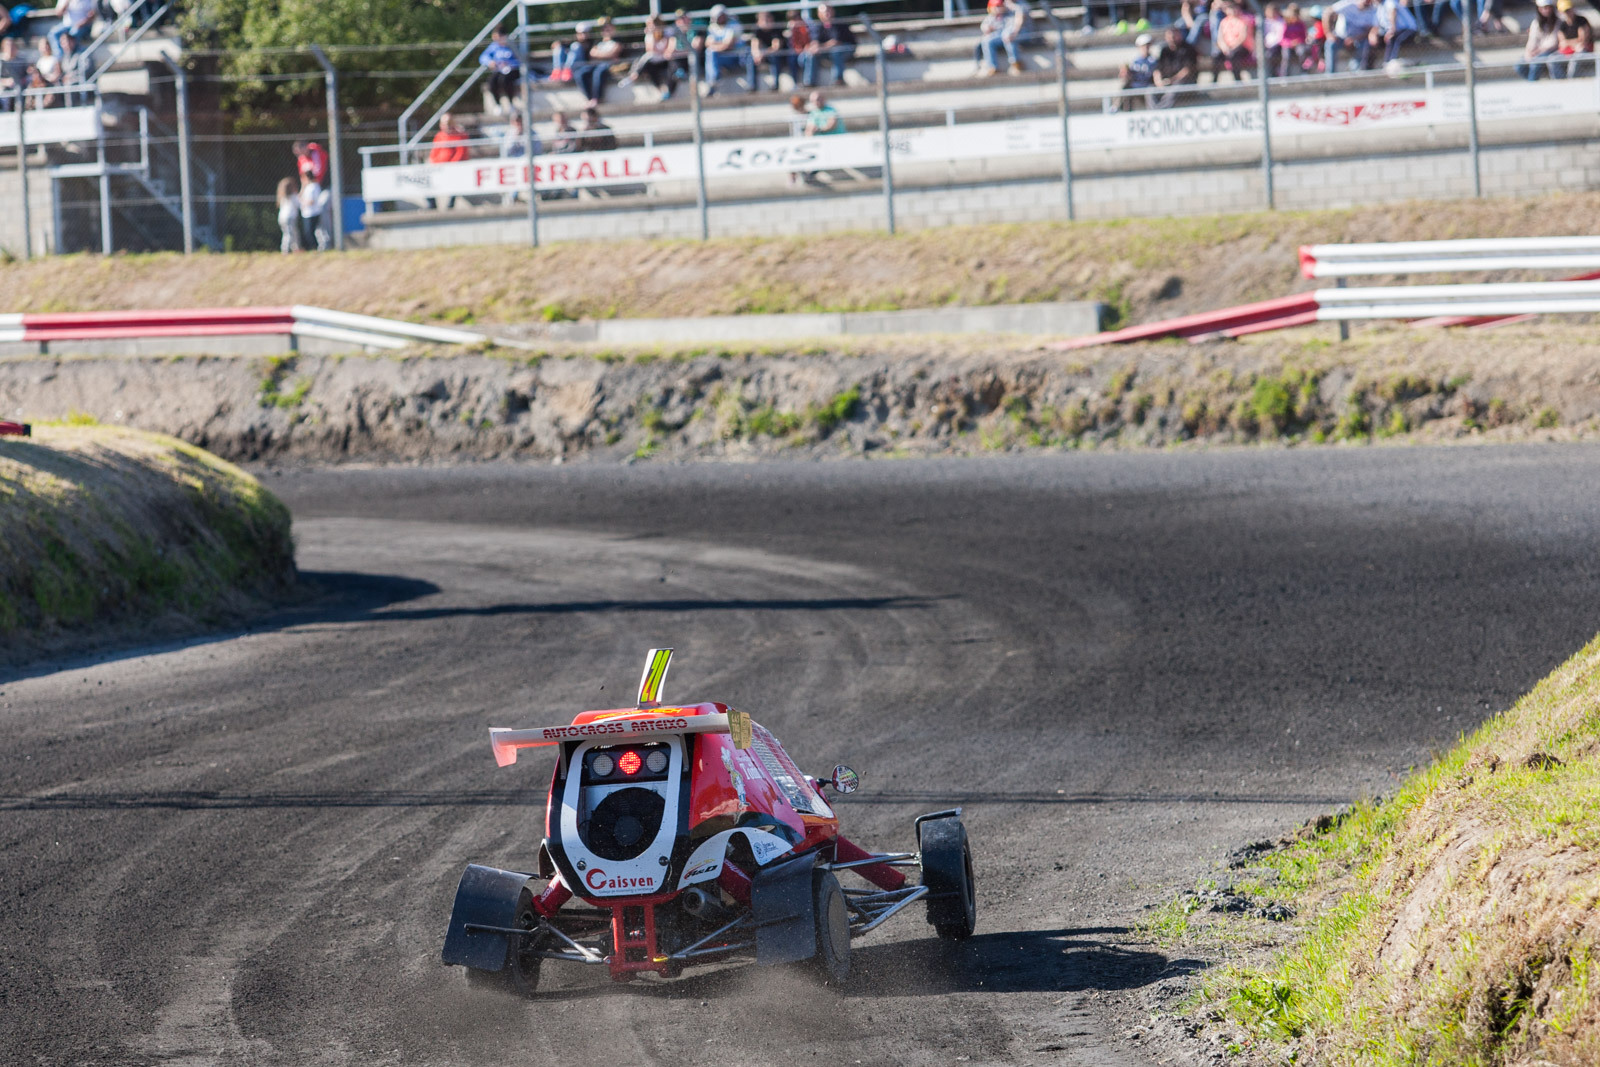 003 Autocross Arteixo FGA Abril 2016 032